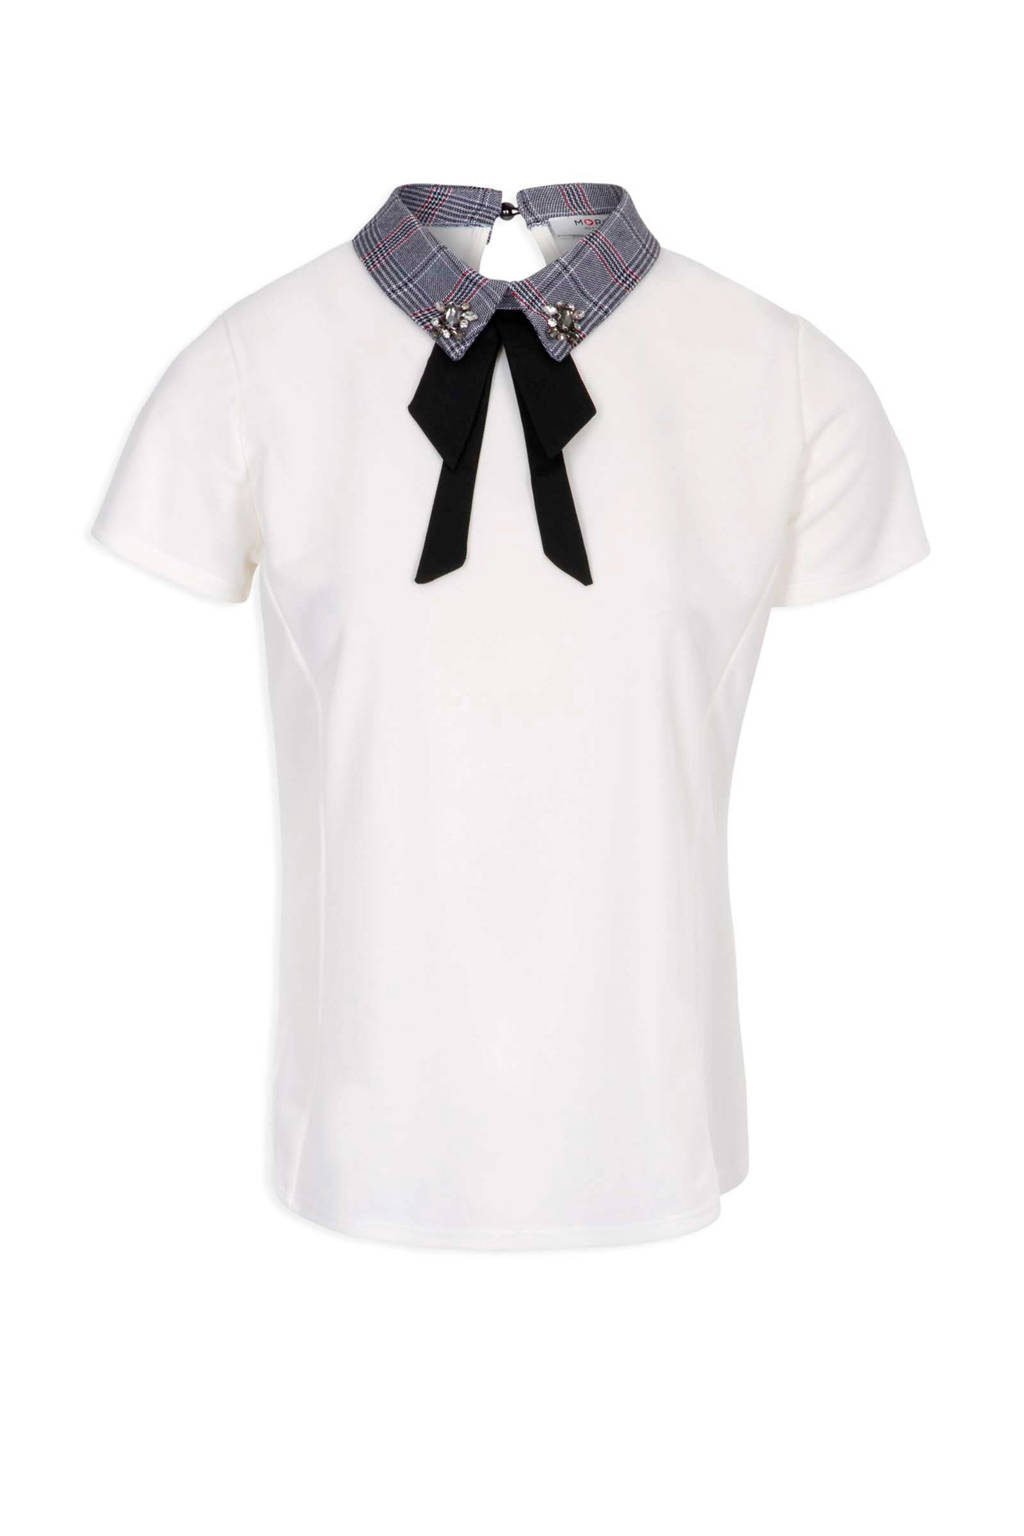 Morgan T-shirt met kraag ecru, Ecru